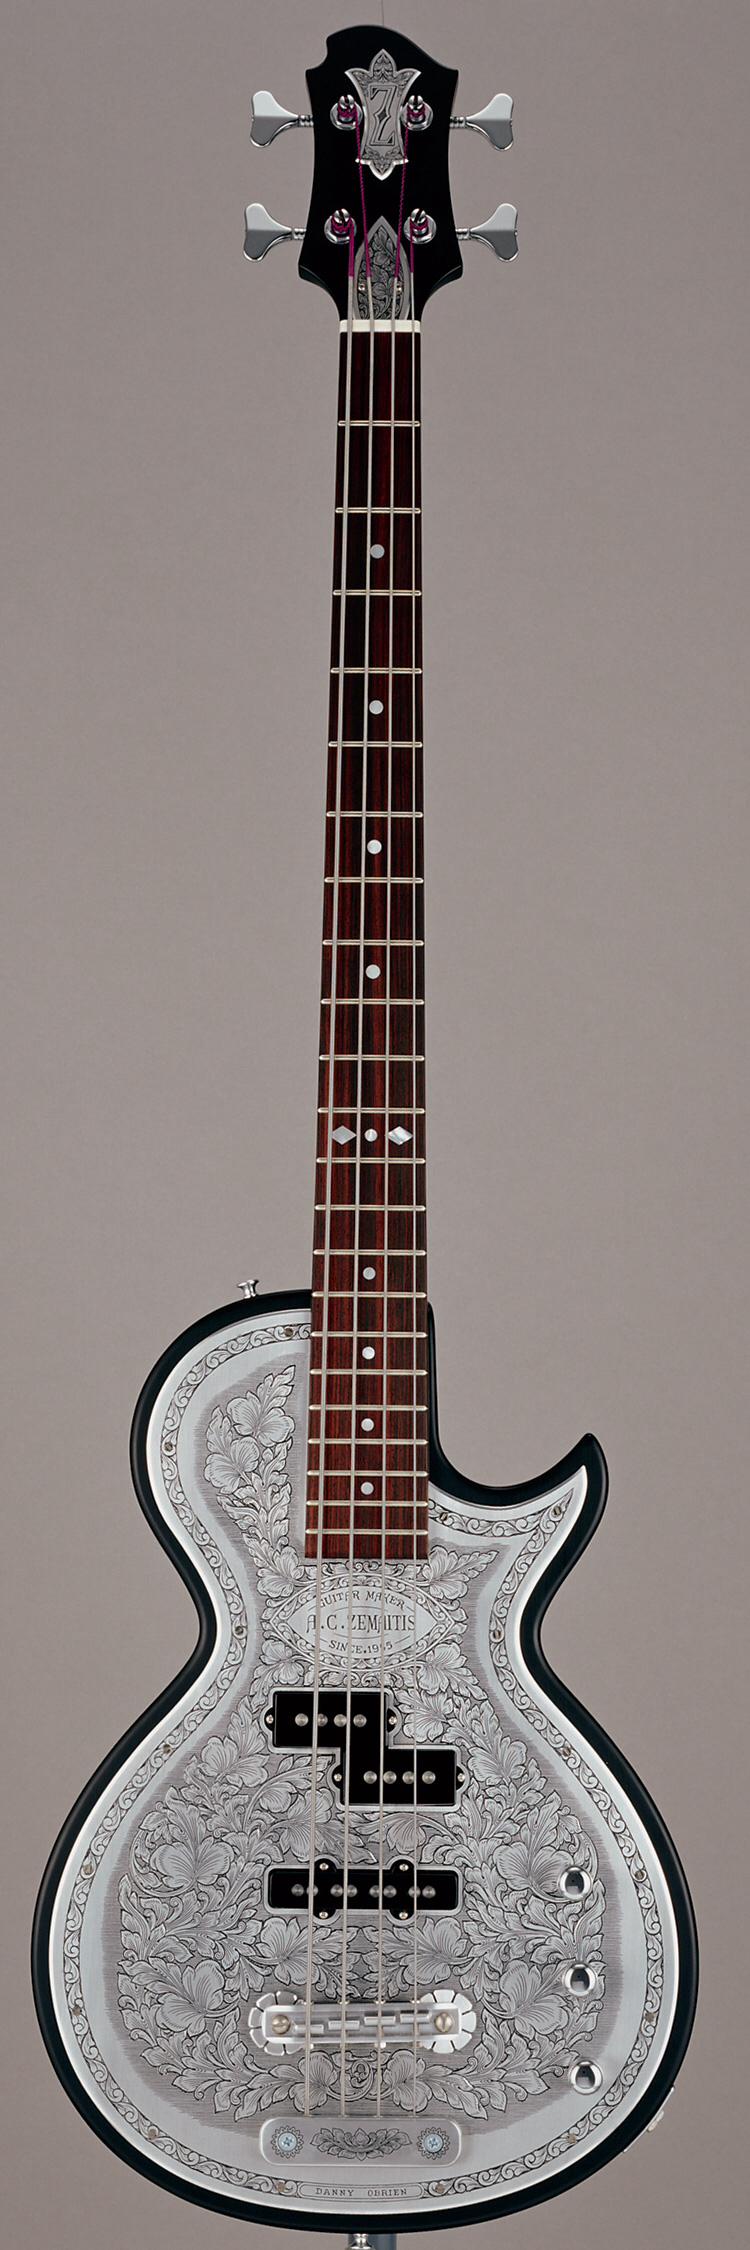 zemaitis bmf mcpj mbk metal front bass guitars amplifiers guitar acoustic guitar custom. Black Bedroom Furniture Sets. Home Design Ideas